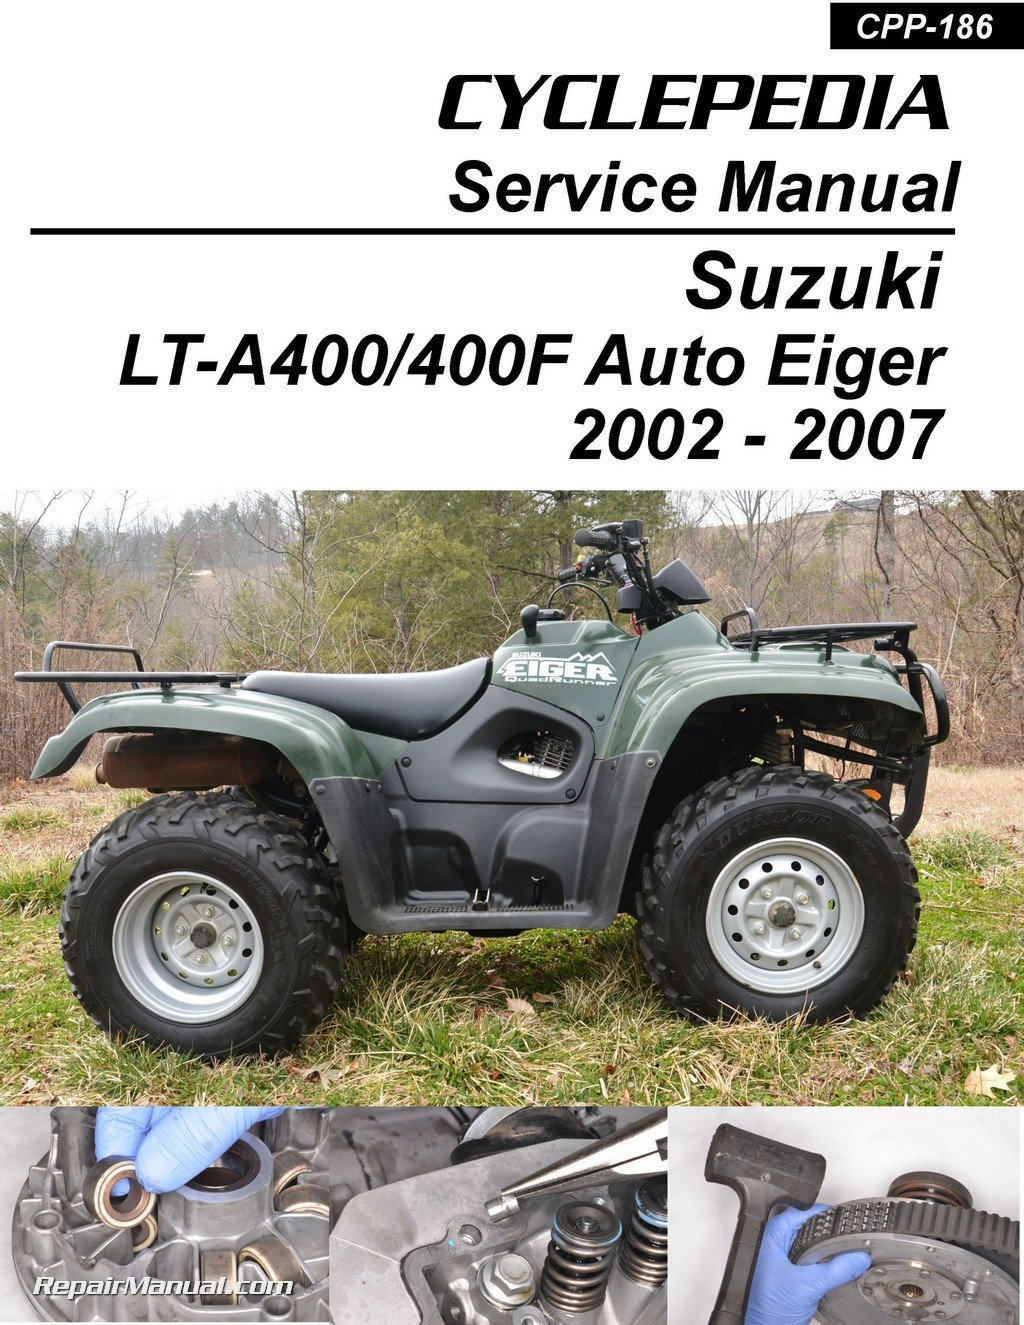 CPP-186-Print Suzuki Auto Shifter Eiger LT-A400 400F ATV Printed Service  Manual: Manufacturer: Amazon.com: Books